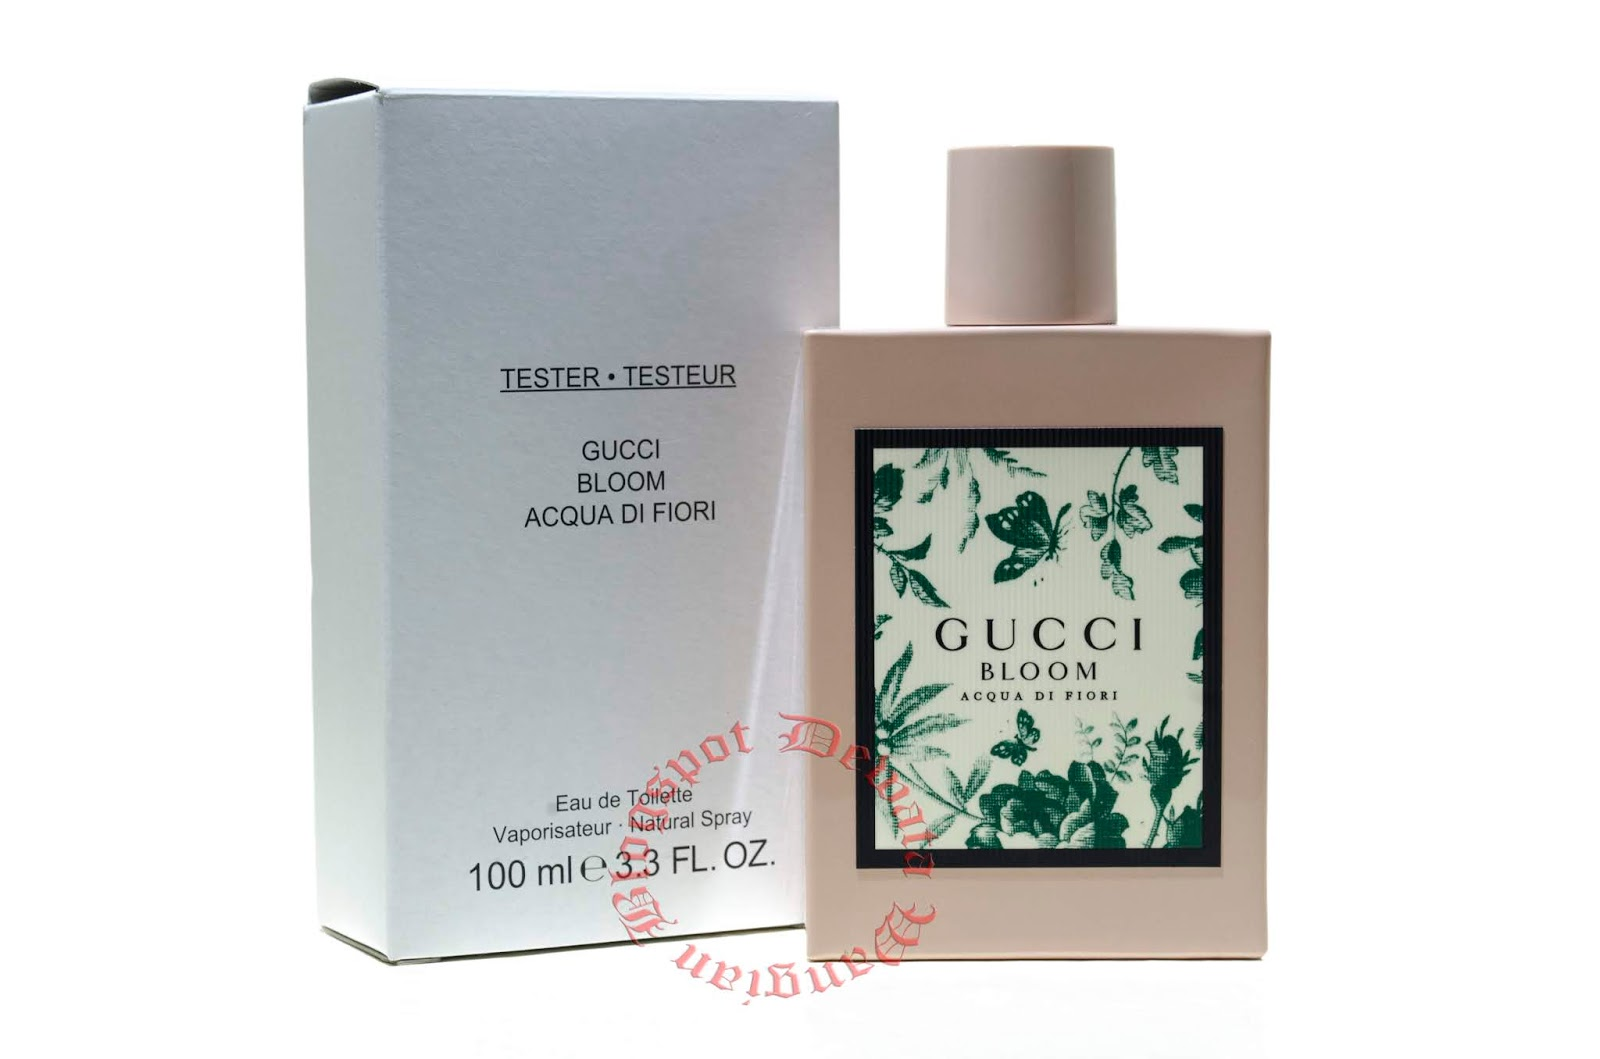 Wangianperfume Cosmetic Original Terbaik Gucci Bloom Aqua Di